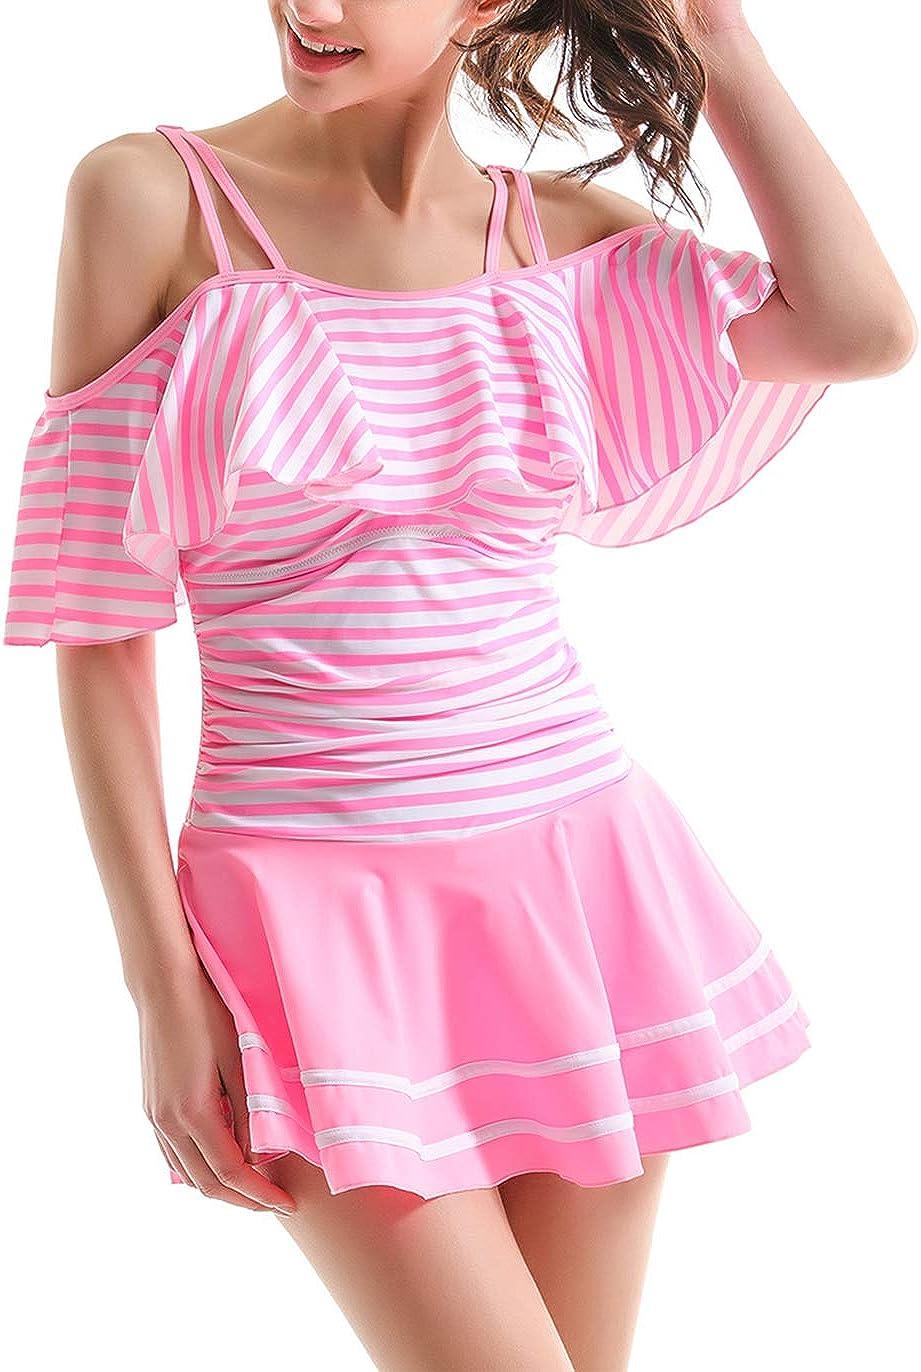 COCOPEAR Womens One Piece Flounce Swimsuit Off Shoulder Bathing Suit Tummy Control Swimdress FBA